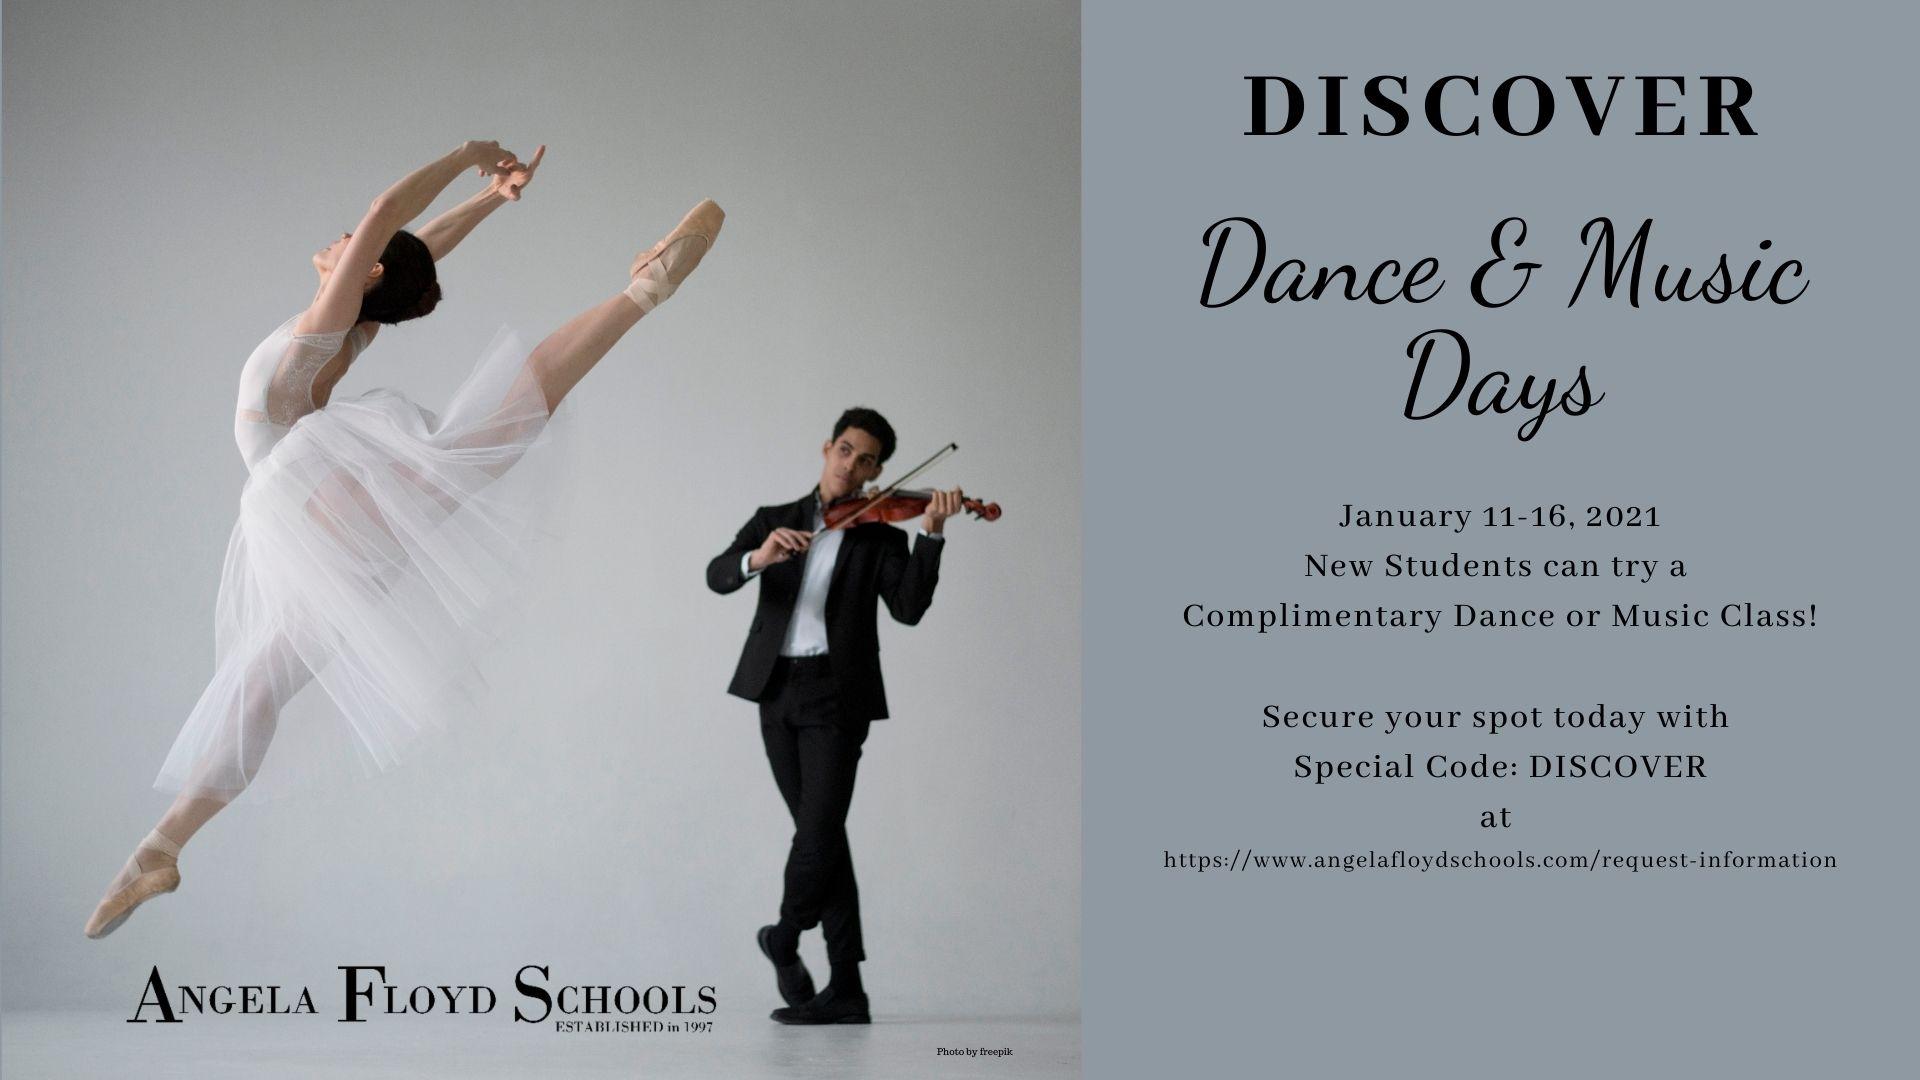 Dance & Music Days at AFSchools